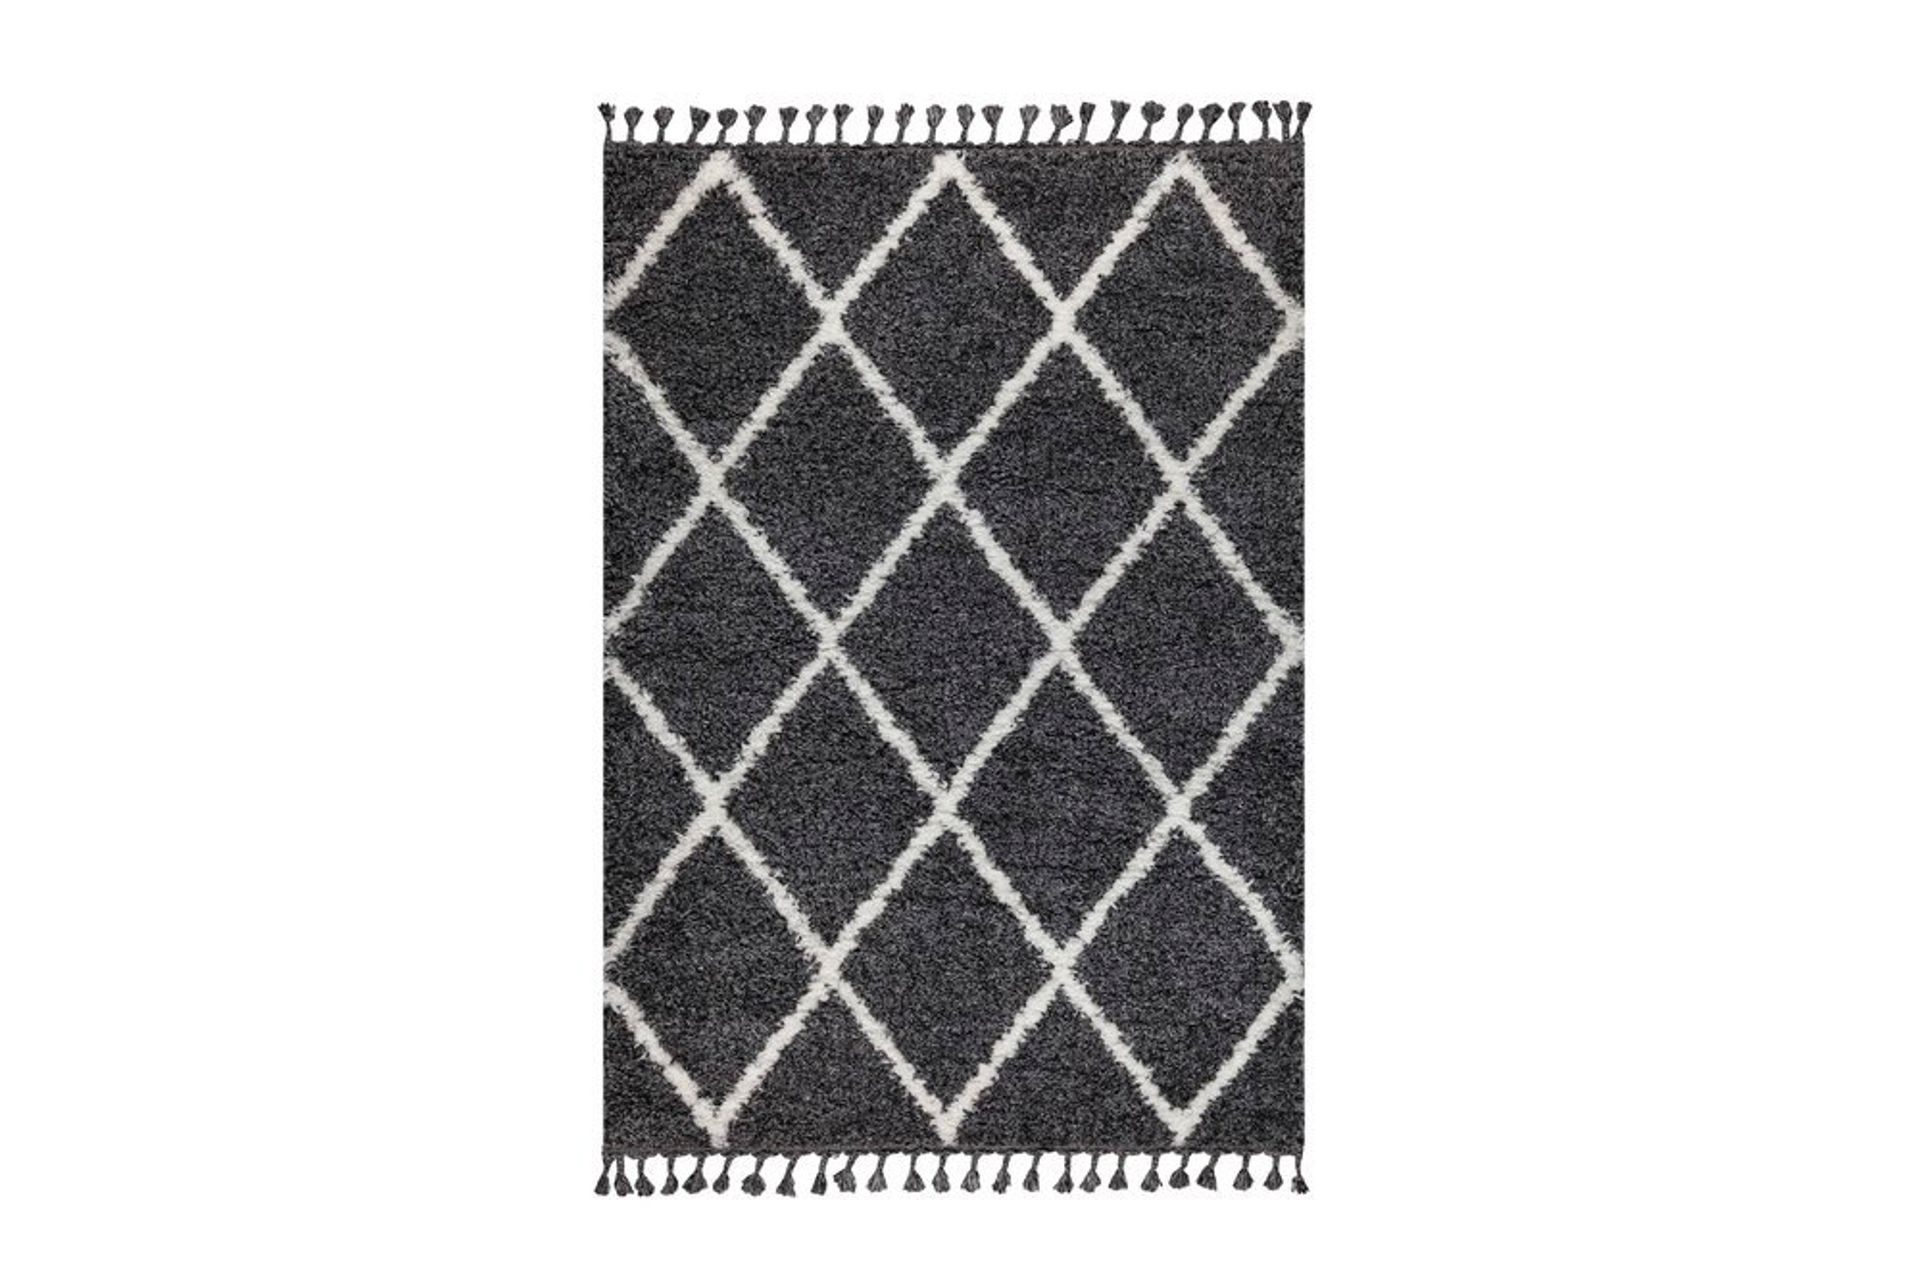 Marrakesh Line Rug, 200 x 290, Charcoal & White